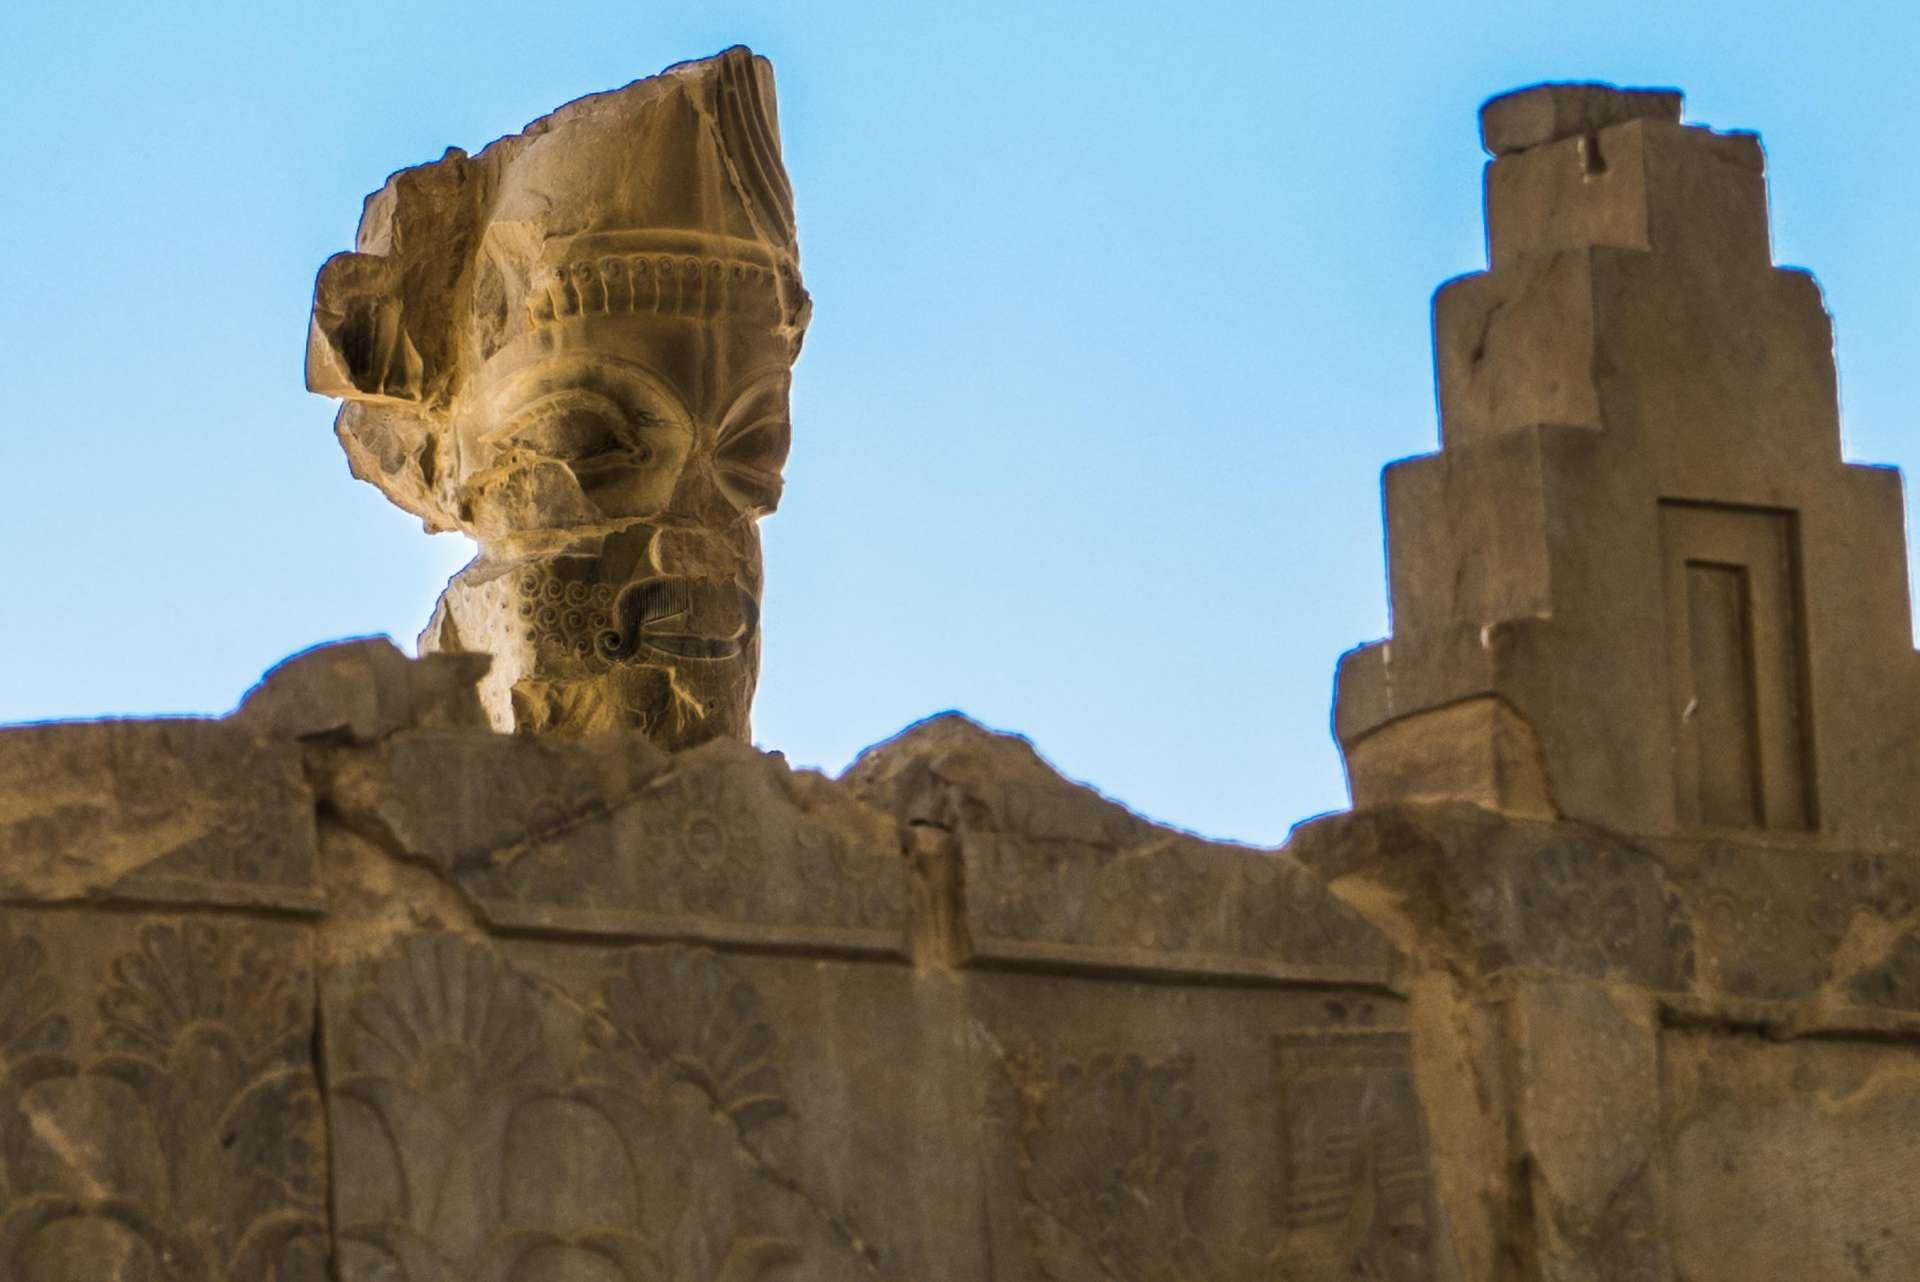 Persepolis Iran - sculpture